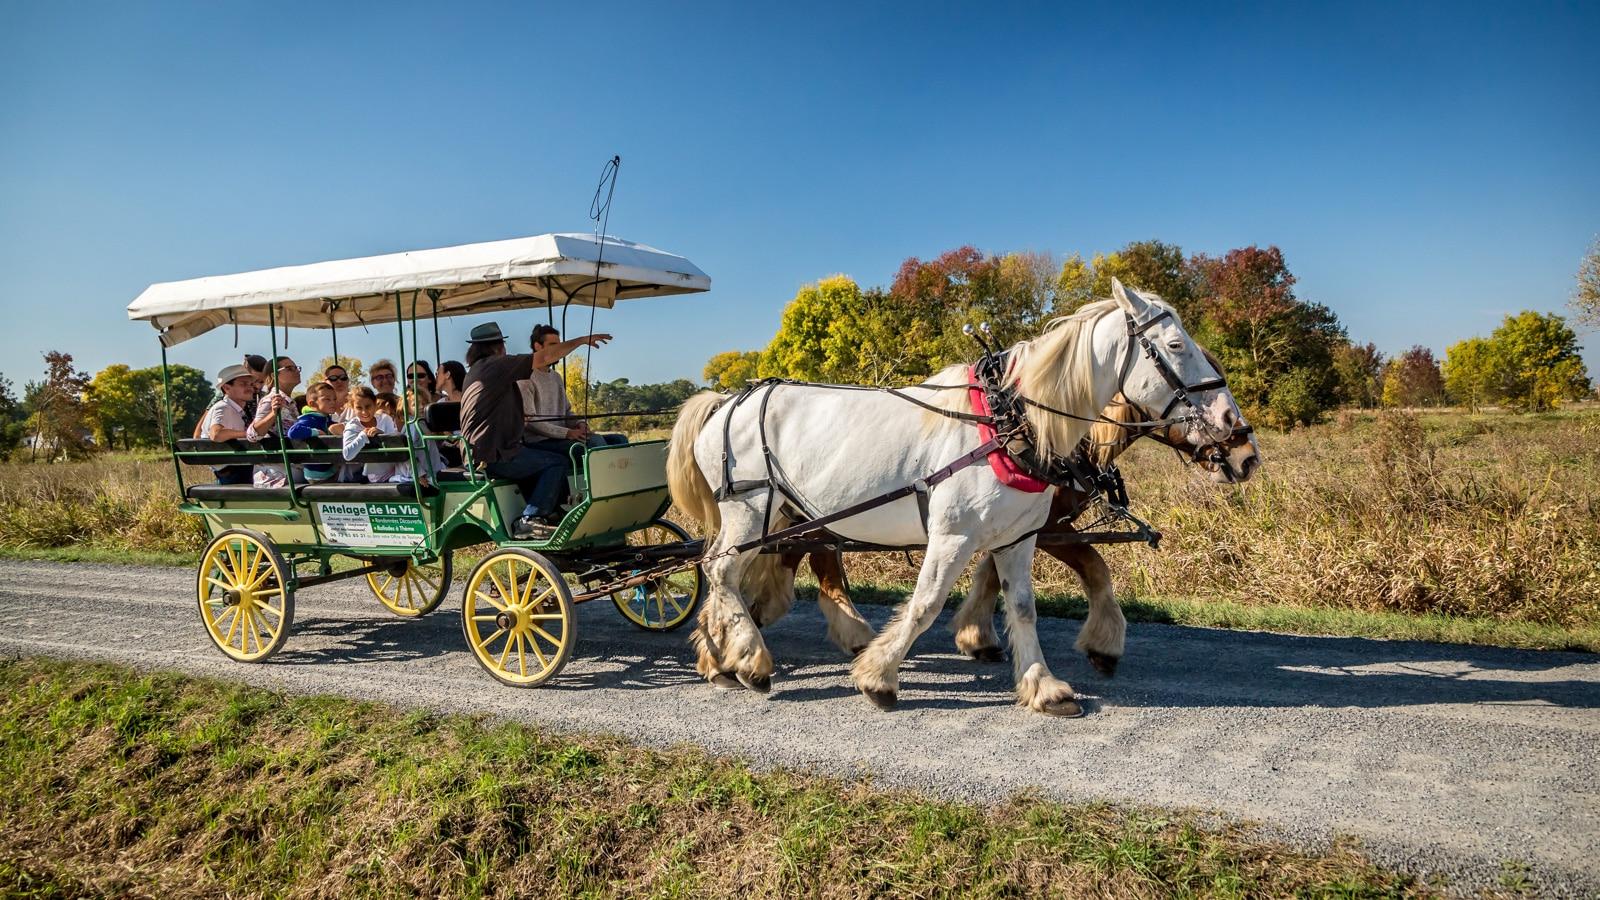 Balade à cheval en calèche en Vendée, Stéphane Grossin